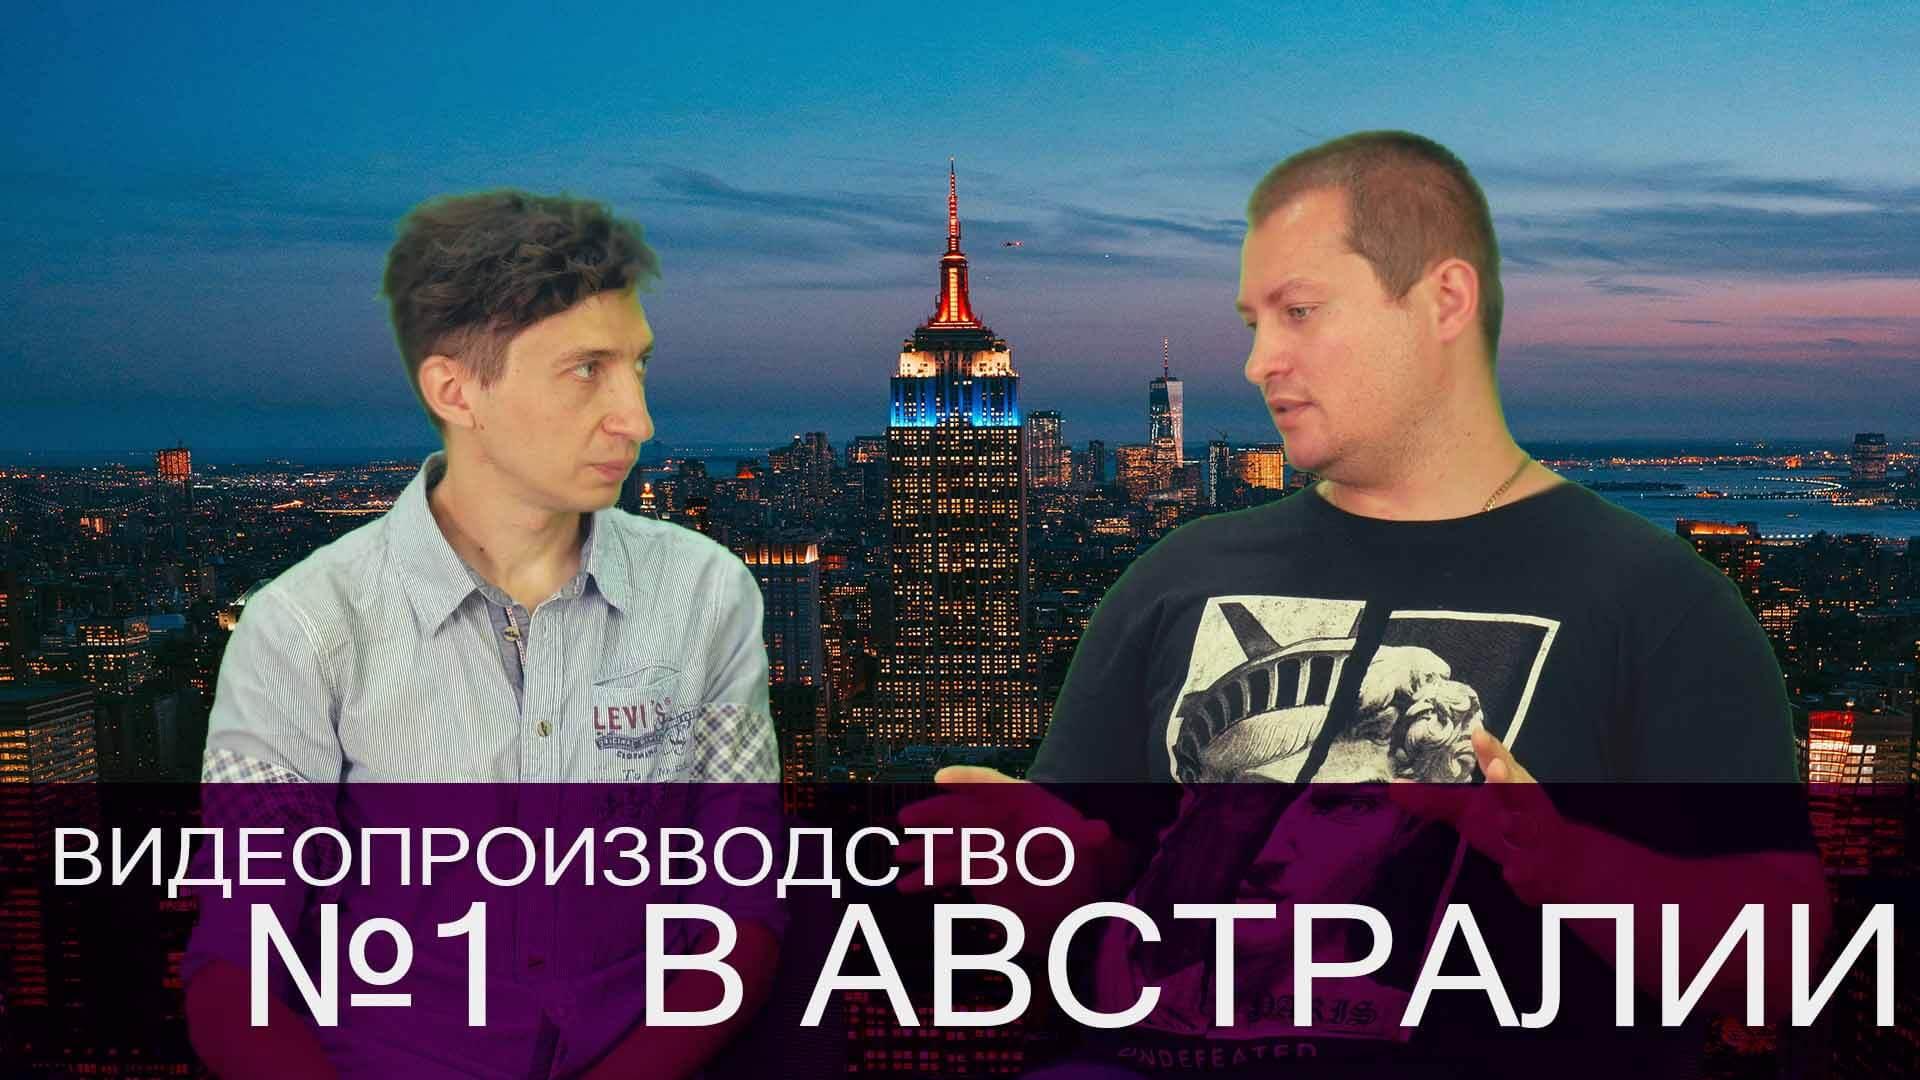 pod au 01 - IGTV, podcast, кино, подкаст